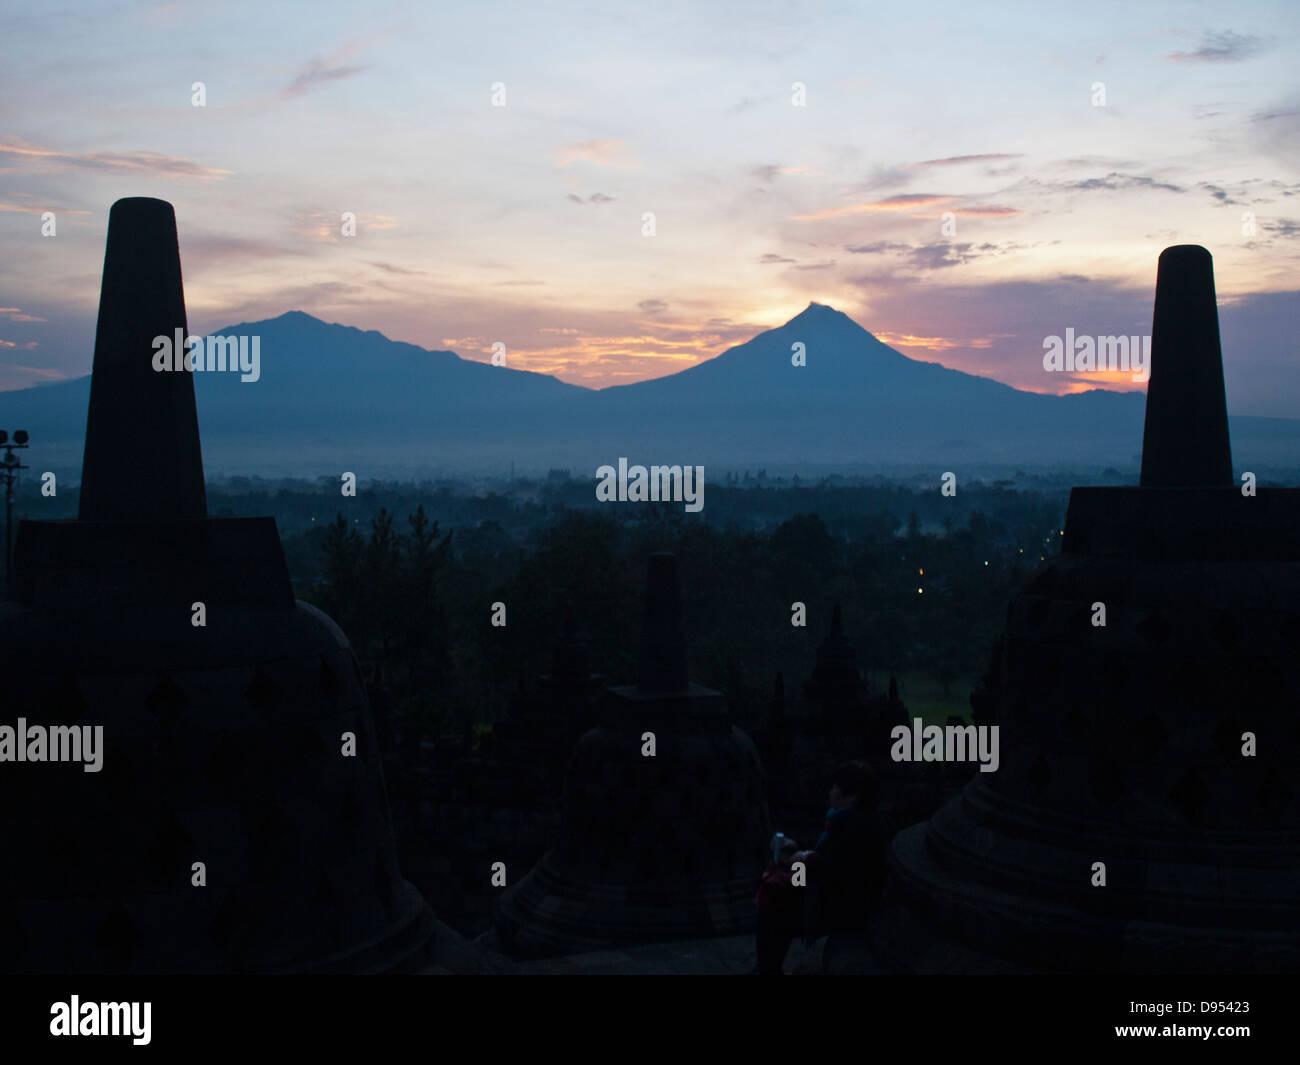 Sunrise at Borobudur temple - Stock Image